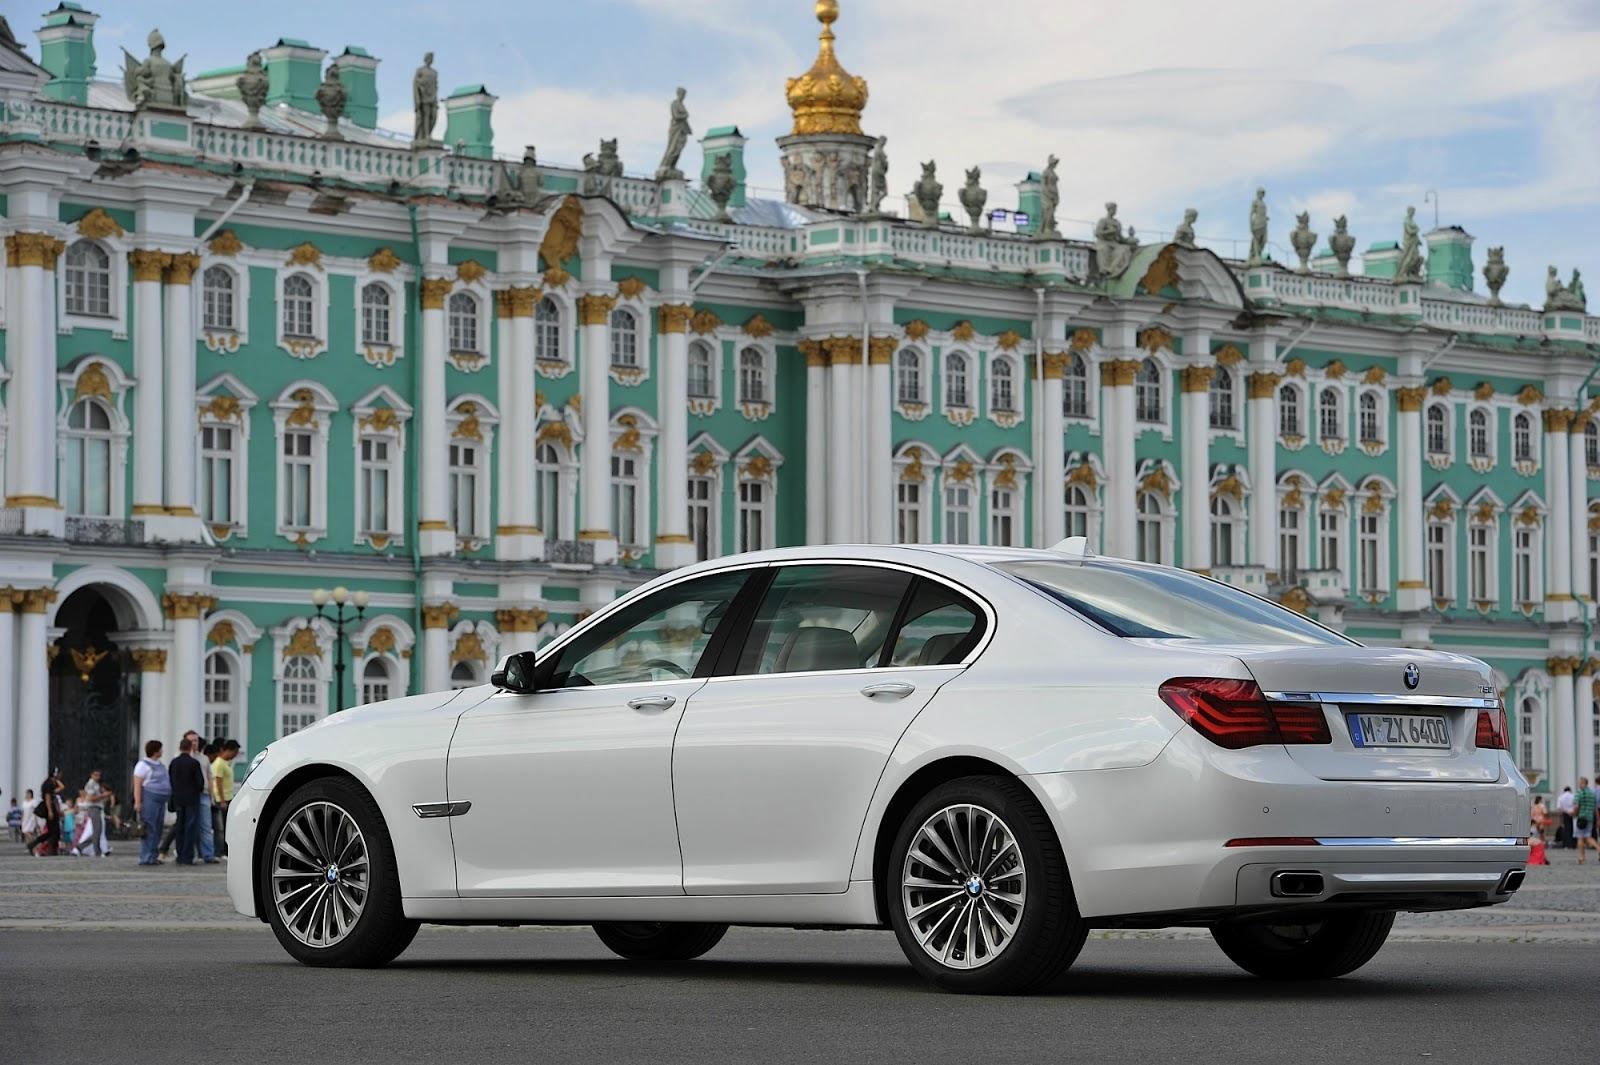 Fiche-occasion-BMW-Serie-7-F-F01-F02-F03-et-F04-9.jpg